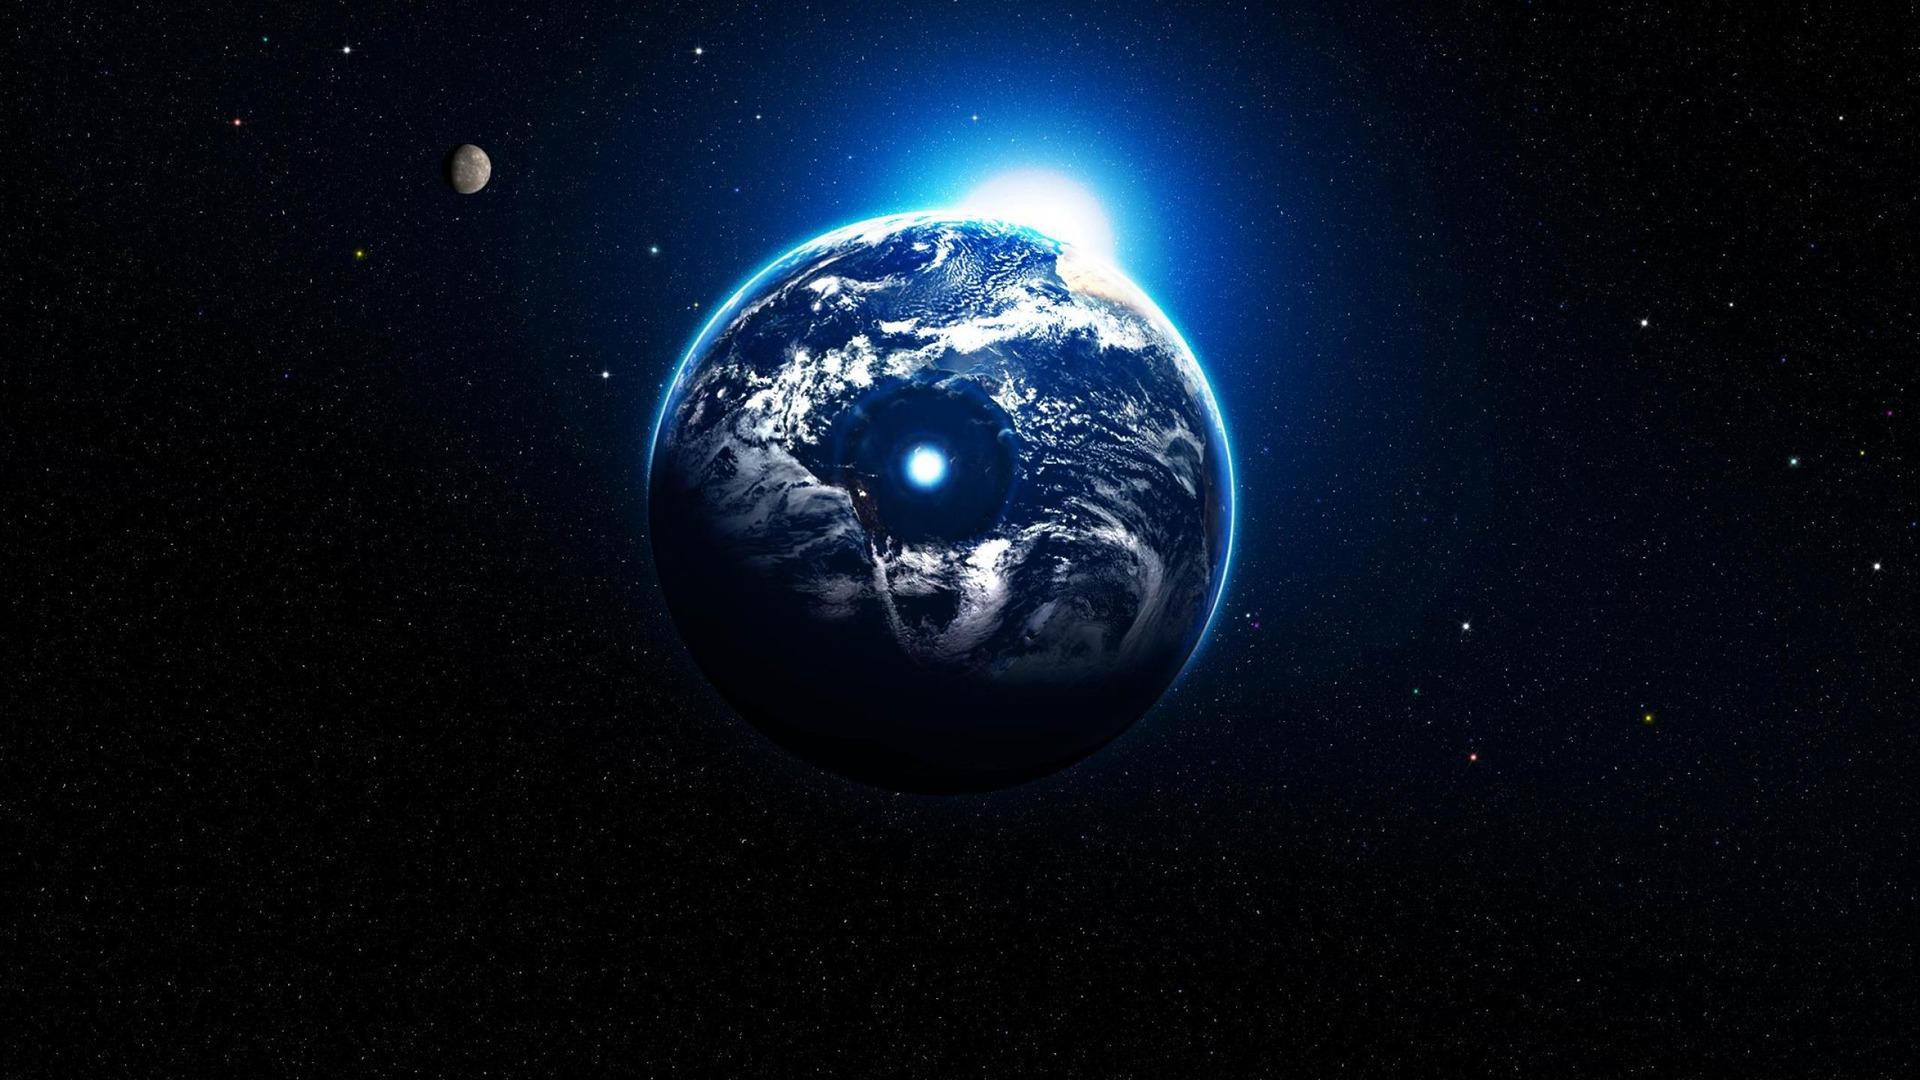 Planet Space Light Hd Space Fondos De Pantalla Avance